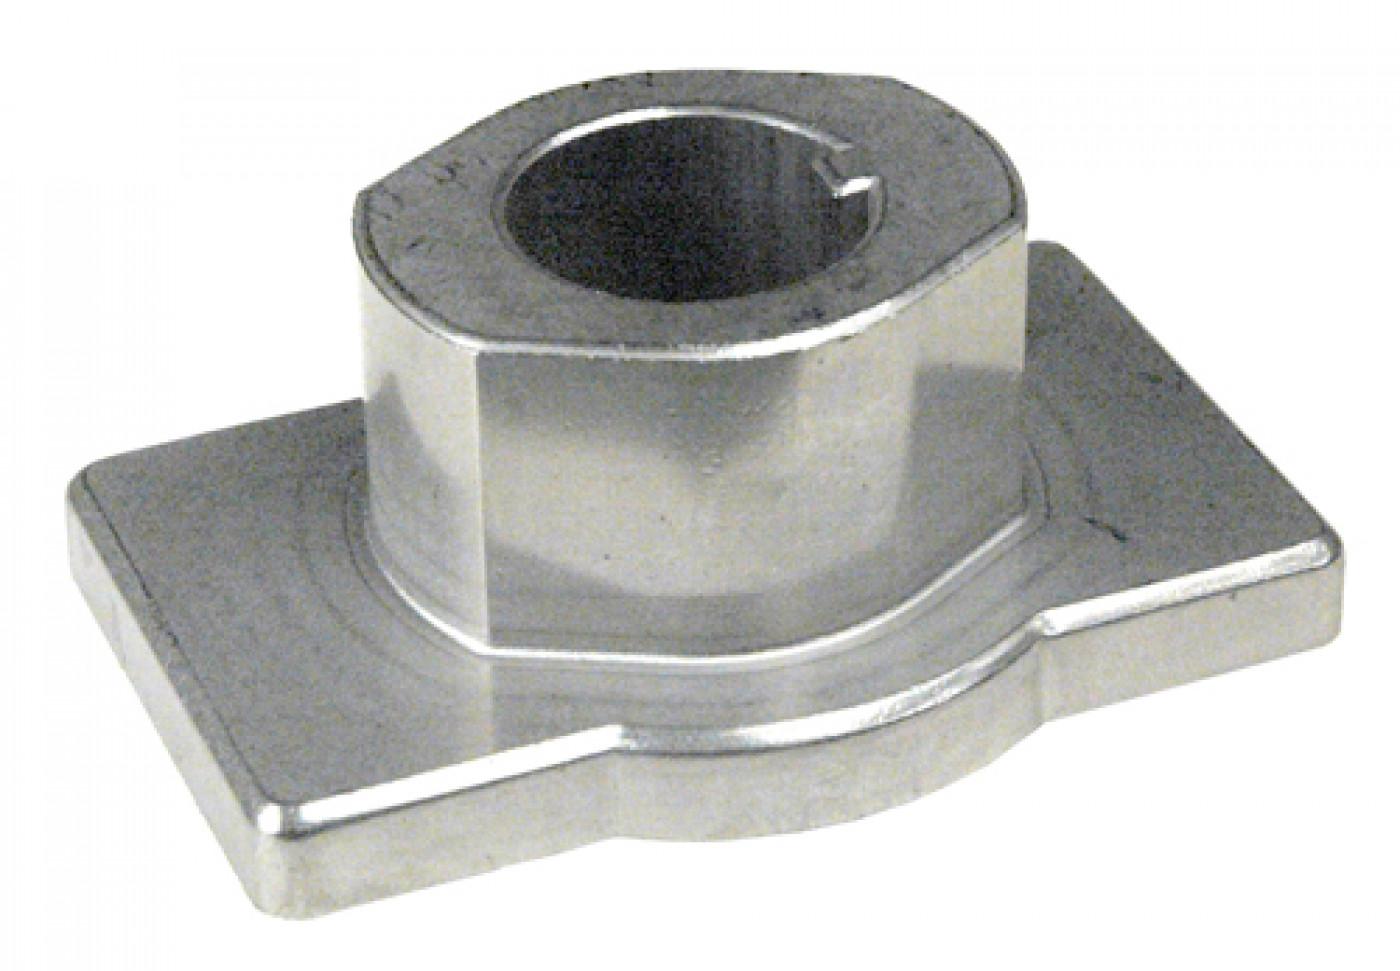 Úchyt nože HUSQVARNA 22,2mm výška 29,8mm - 850977